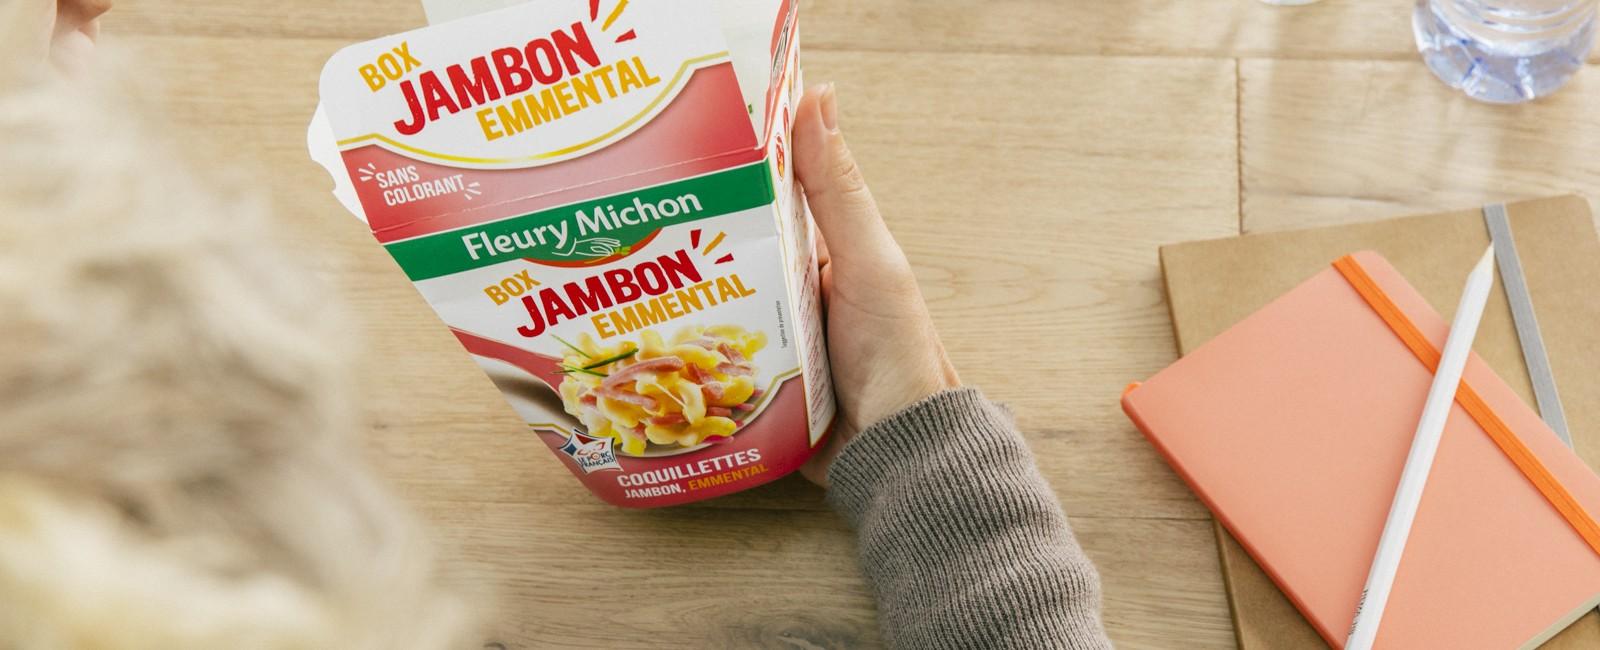 envies box cheesy jambon produits fleury michon